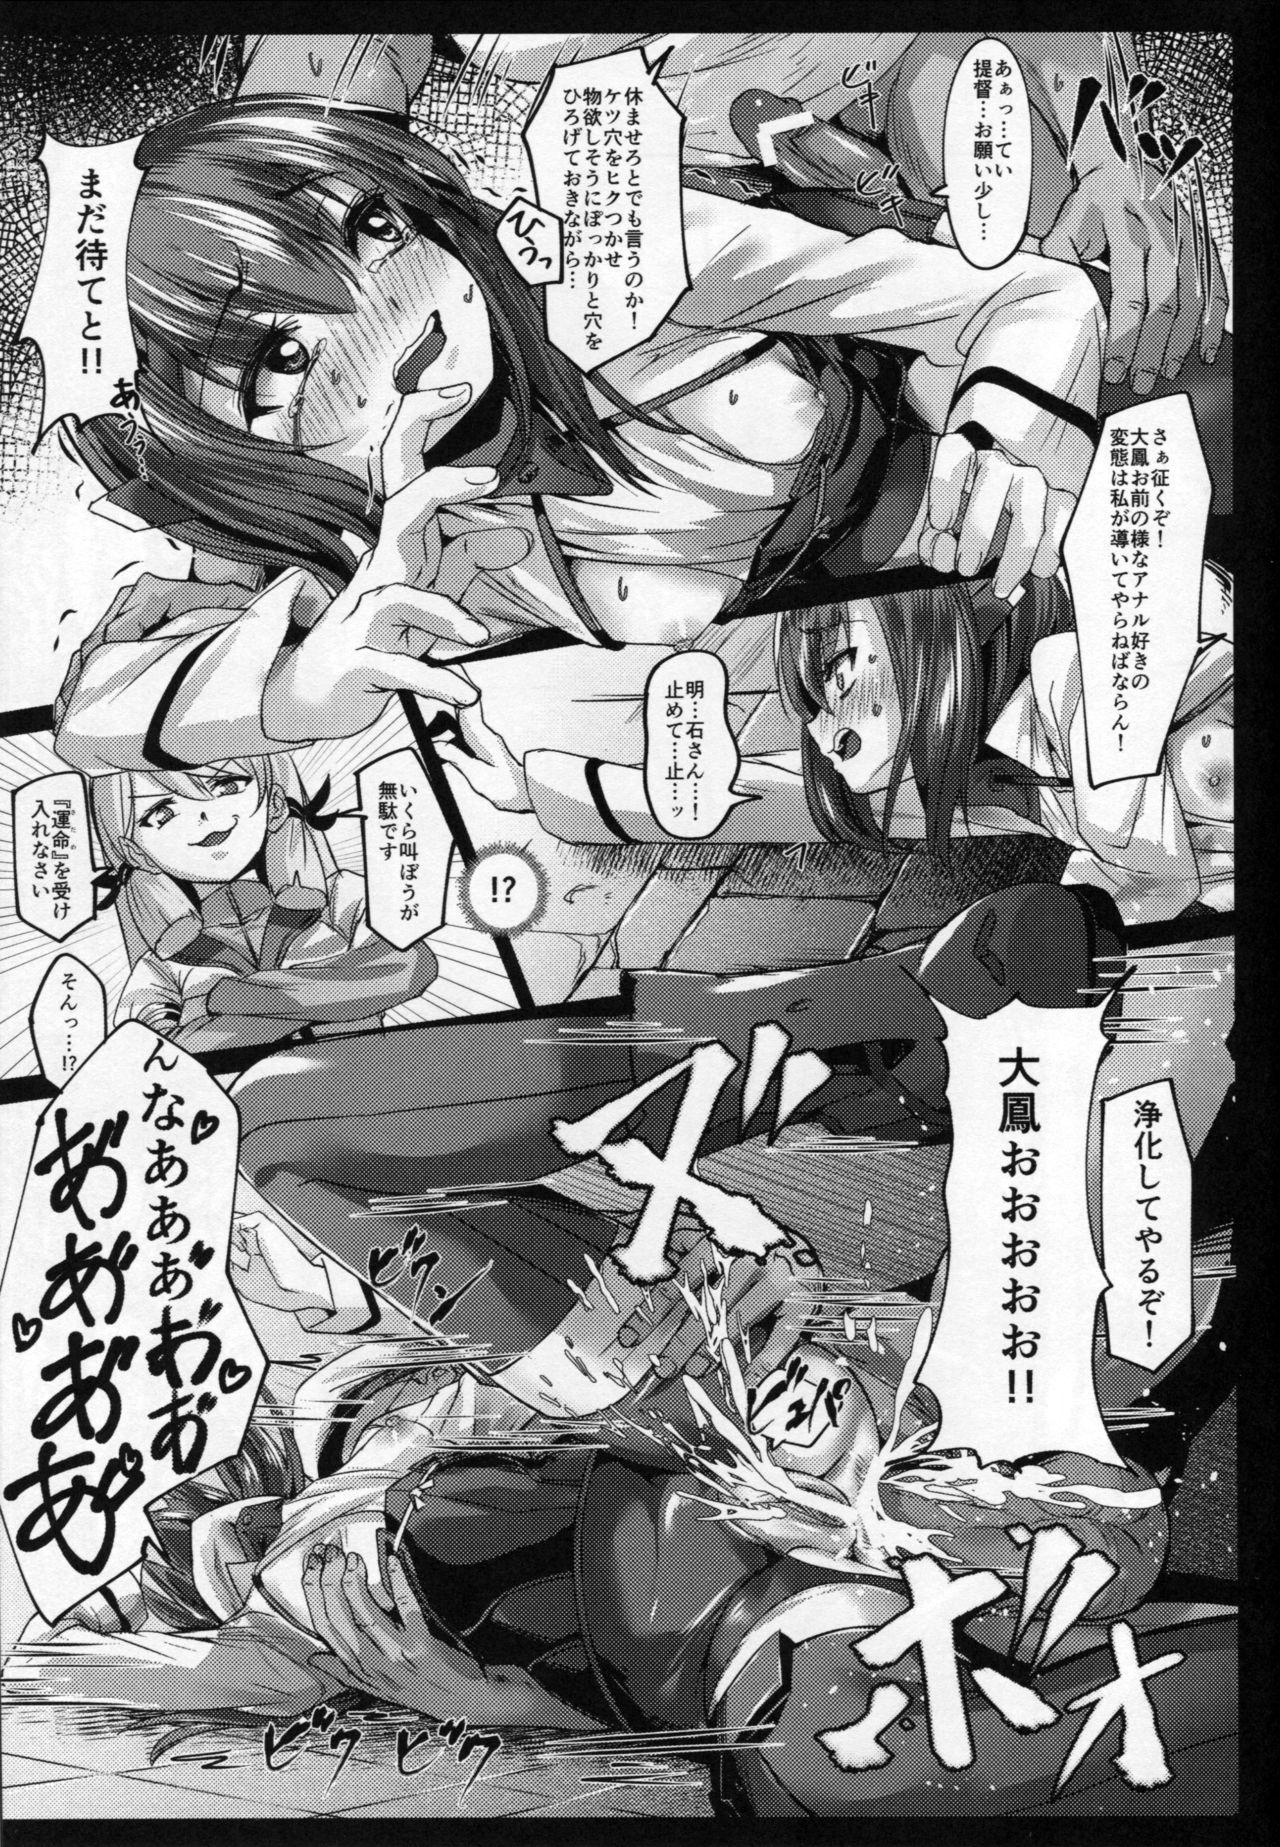 Koushou Ninmu FXX Soukou Kuubo o Jouka Seyo!! 15